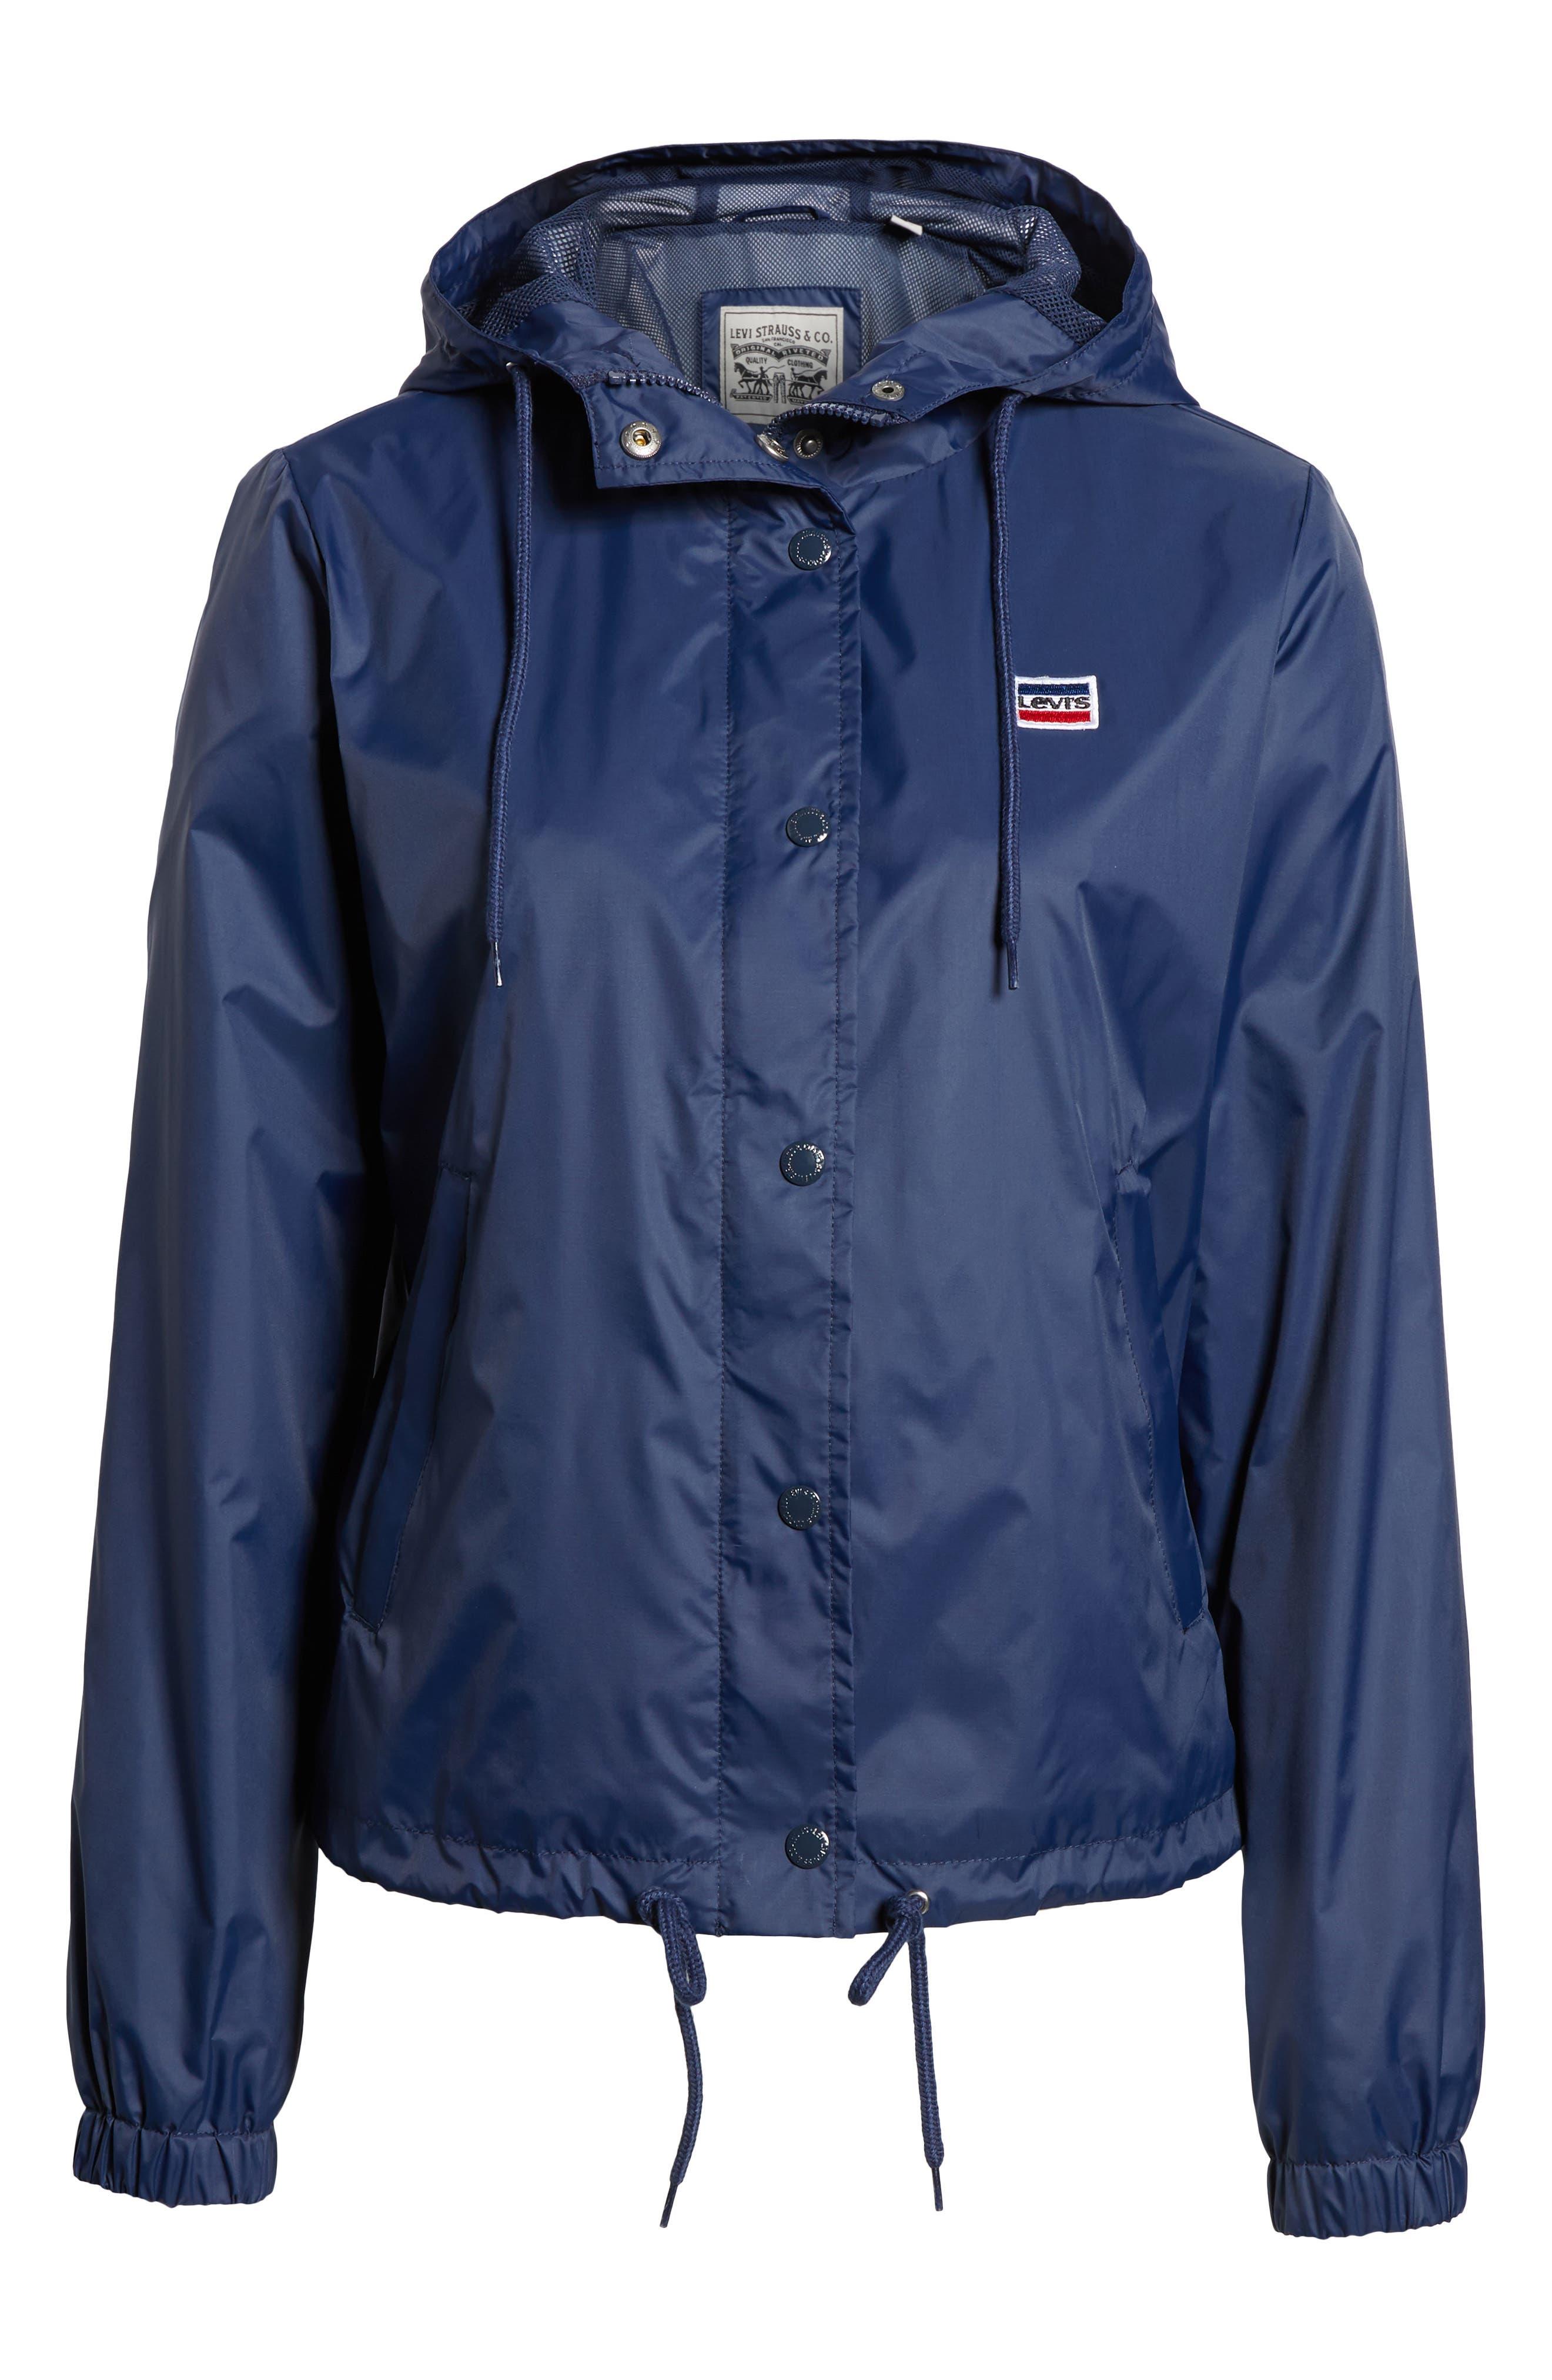 Retro Hooded Coach's Jacket,                             Alternate thumbnail 7, color,                             Navy